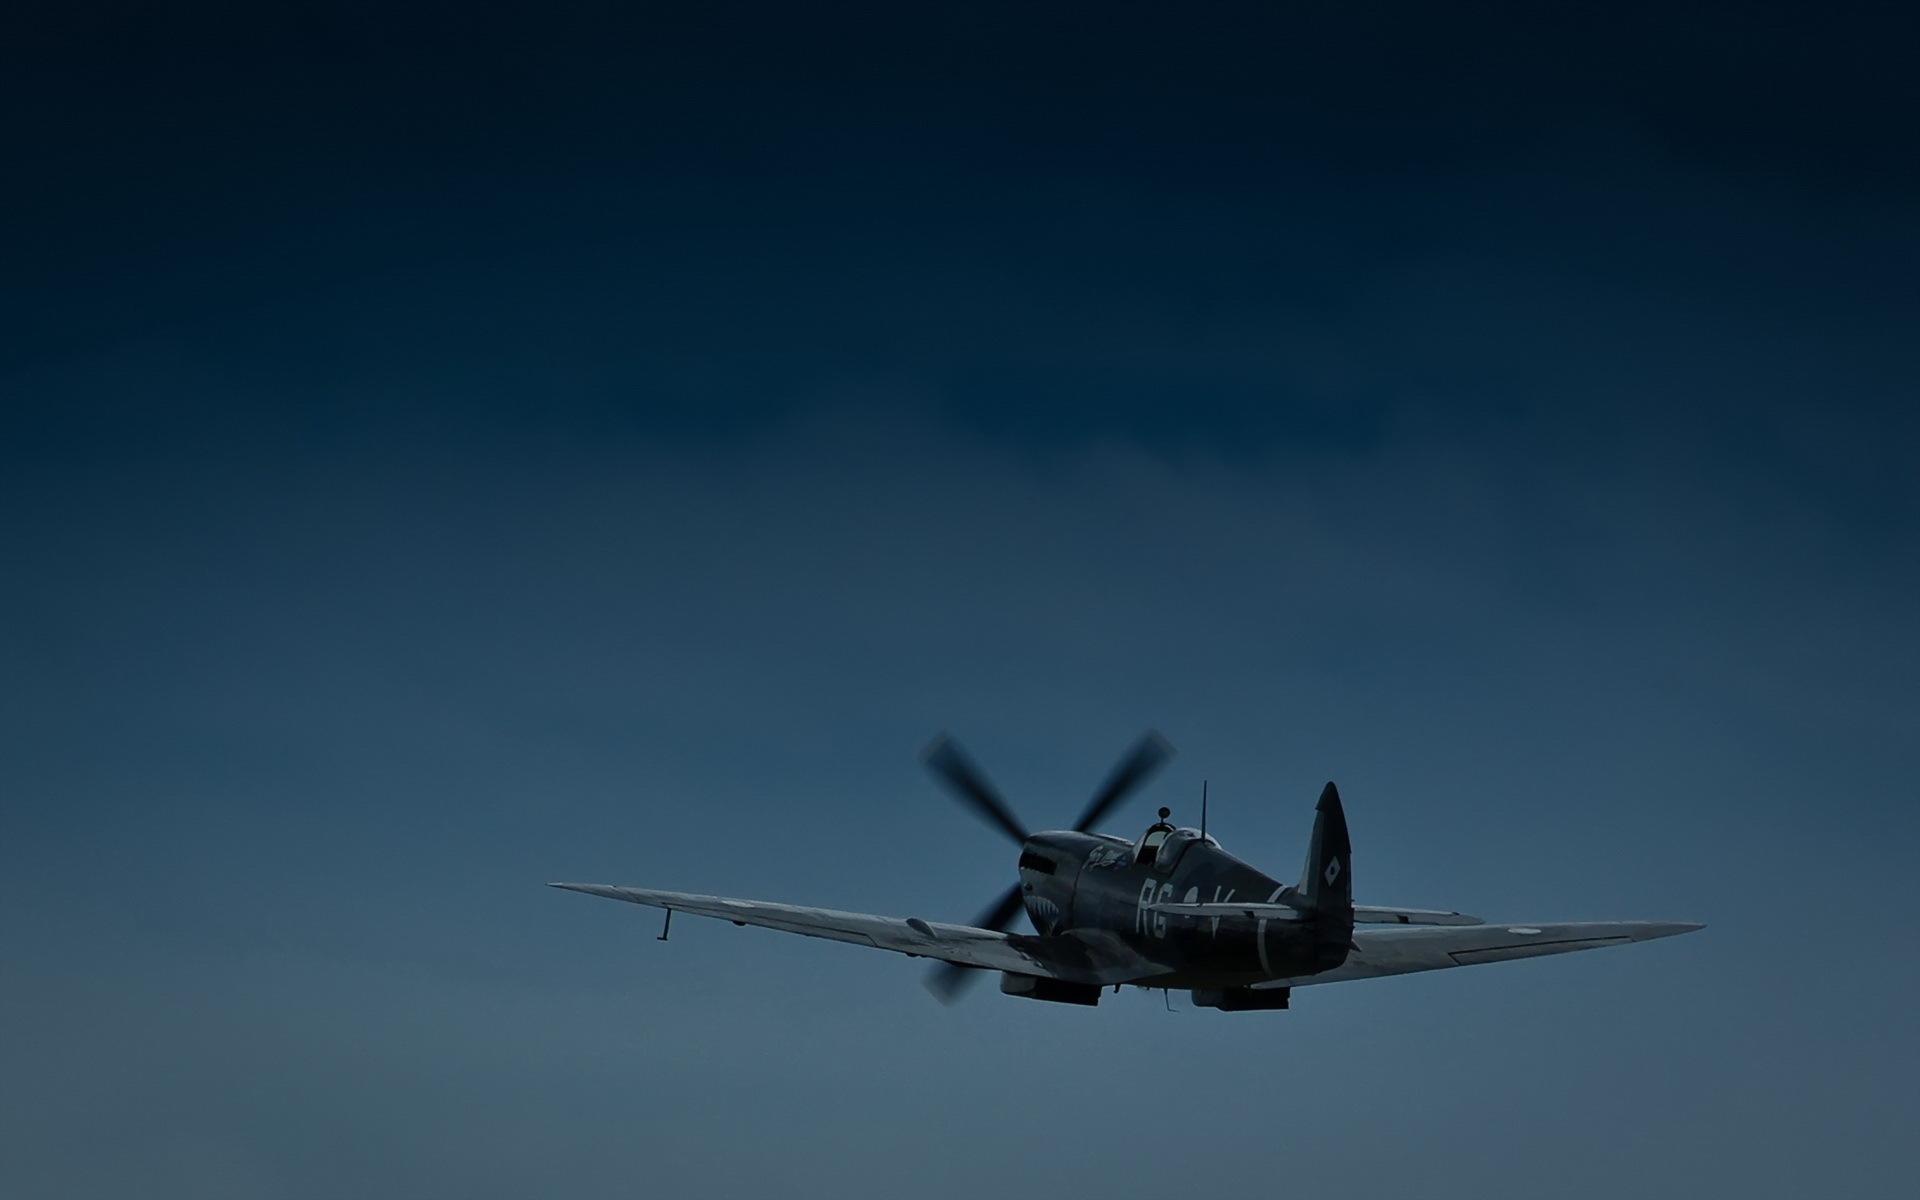 spitfire 31805